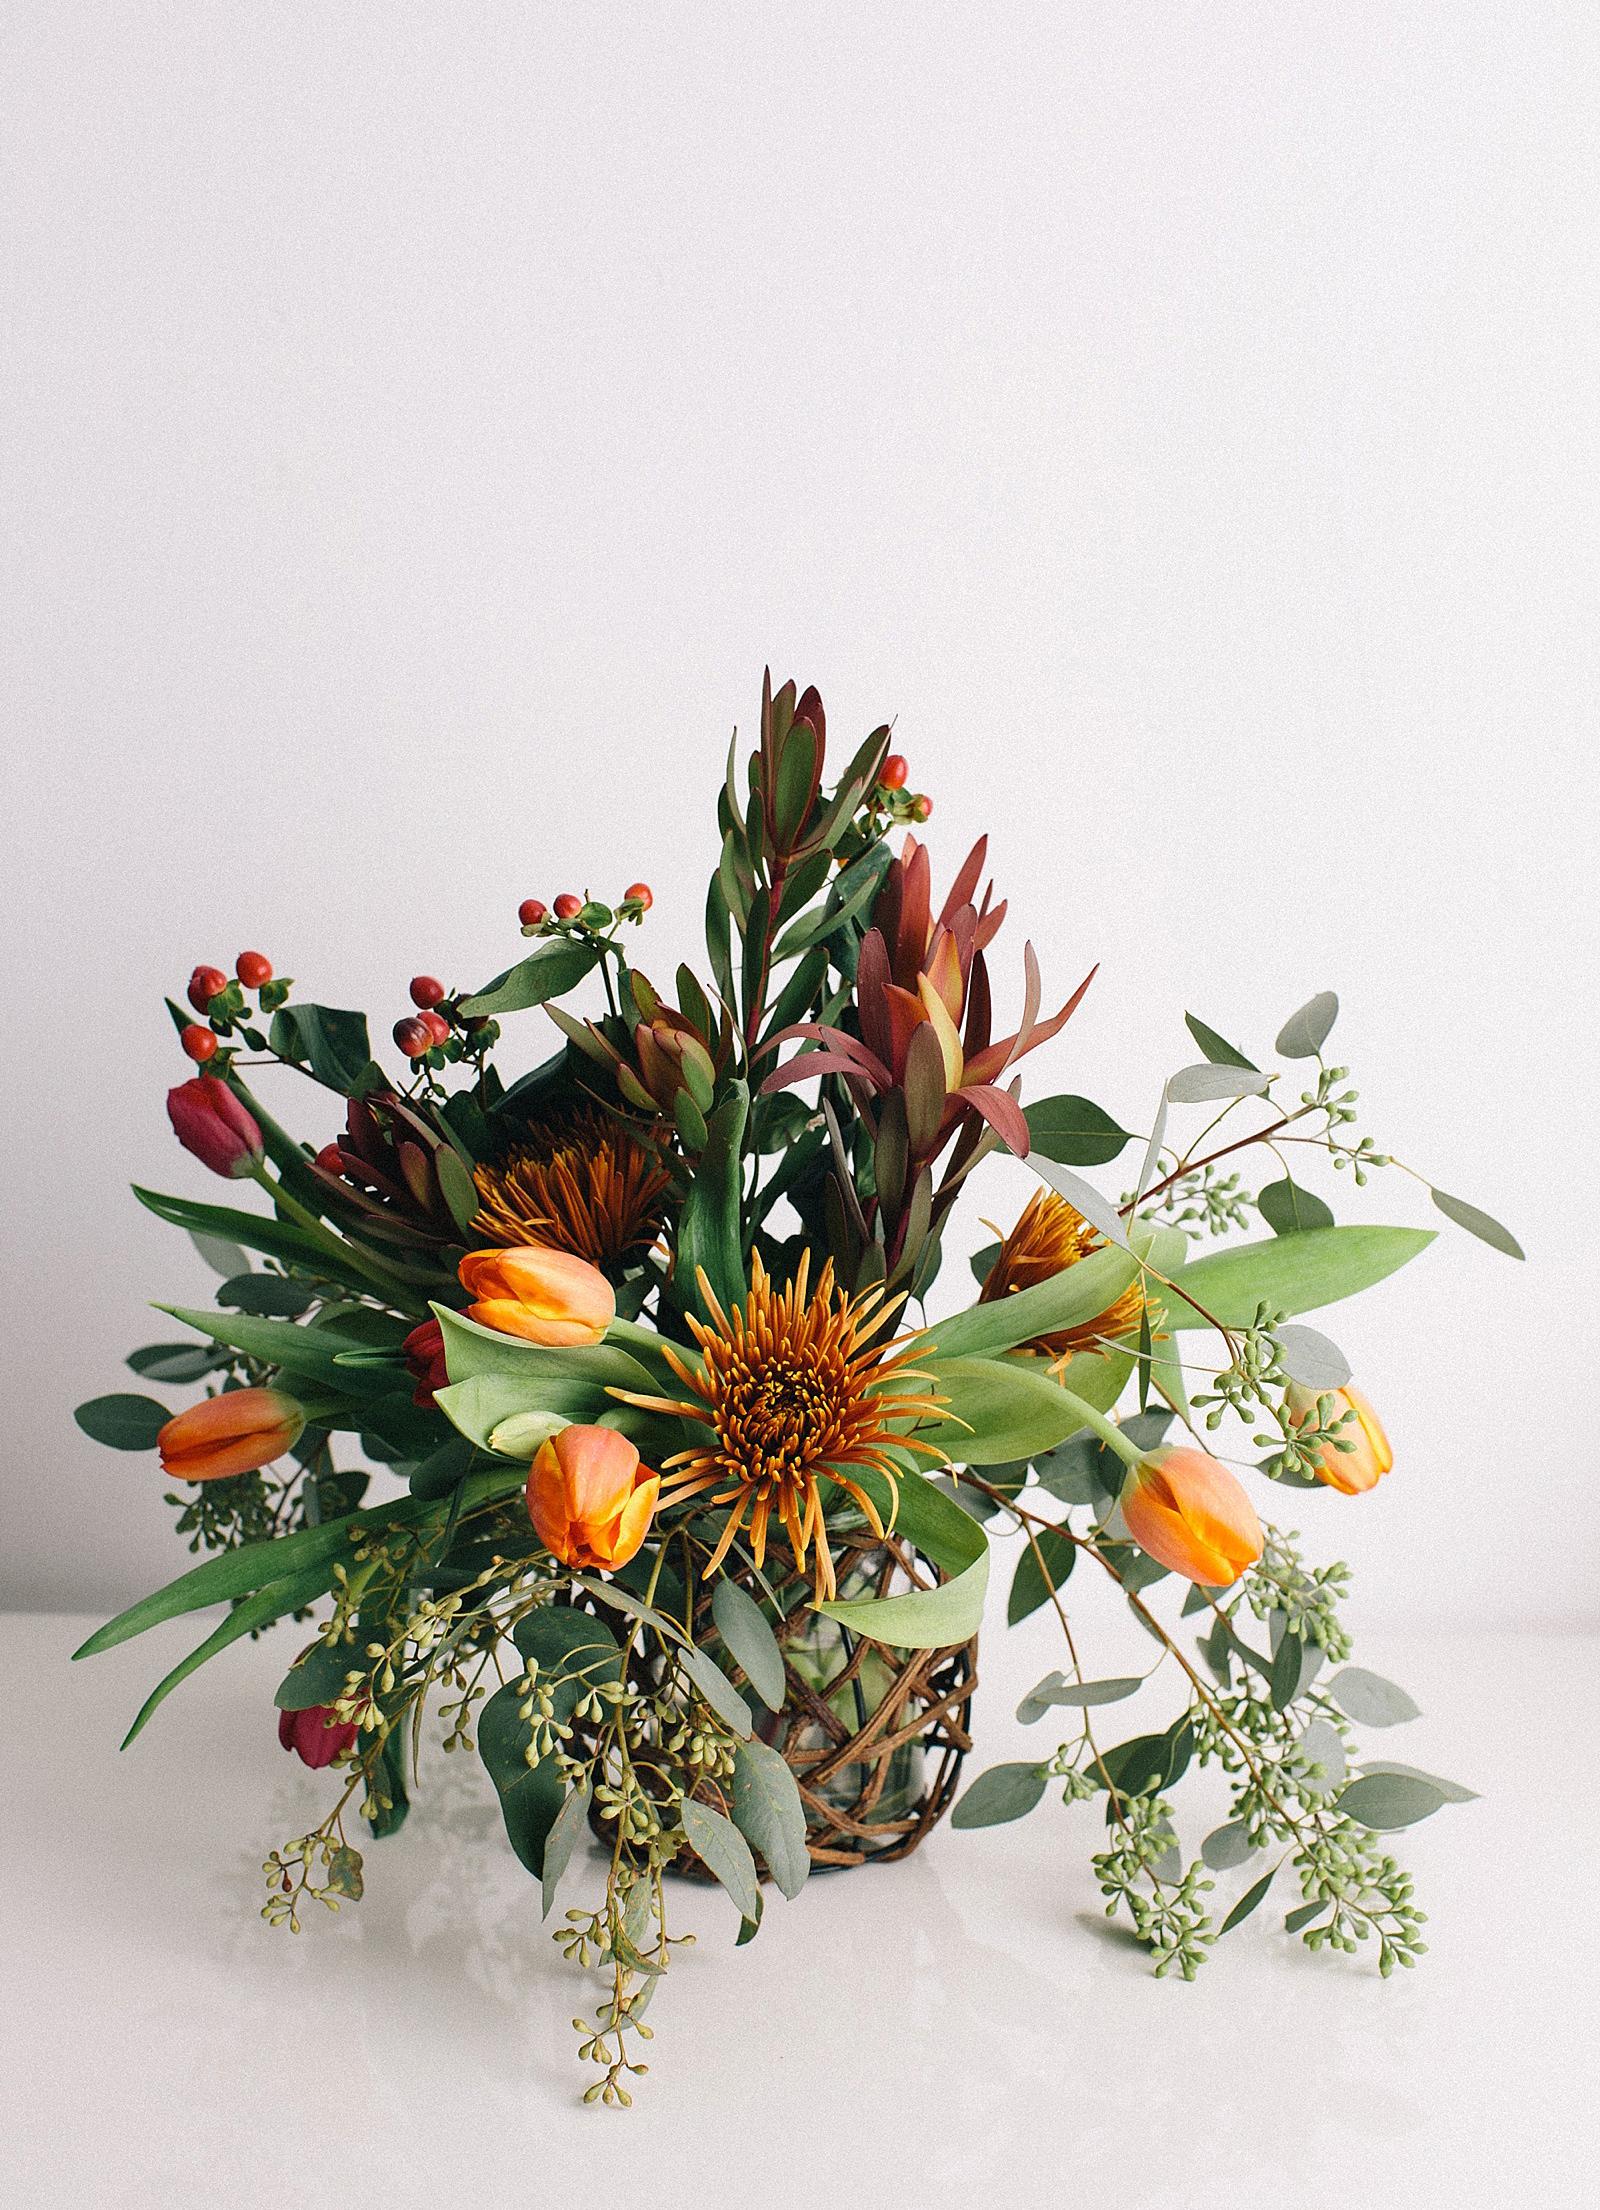 1-pro-flowers-burke-decor-thanksgiving-christmas-tablescape-idea-fall-popsugar-must-have-box-lifestyle-blogger-diana-elizabeth-blog-2214